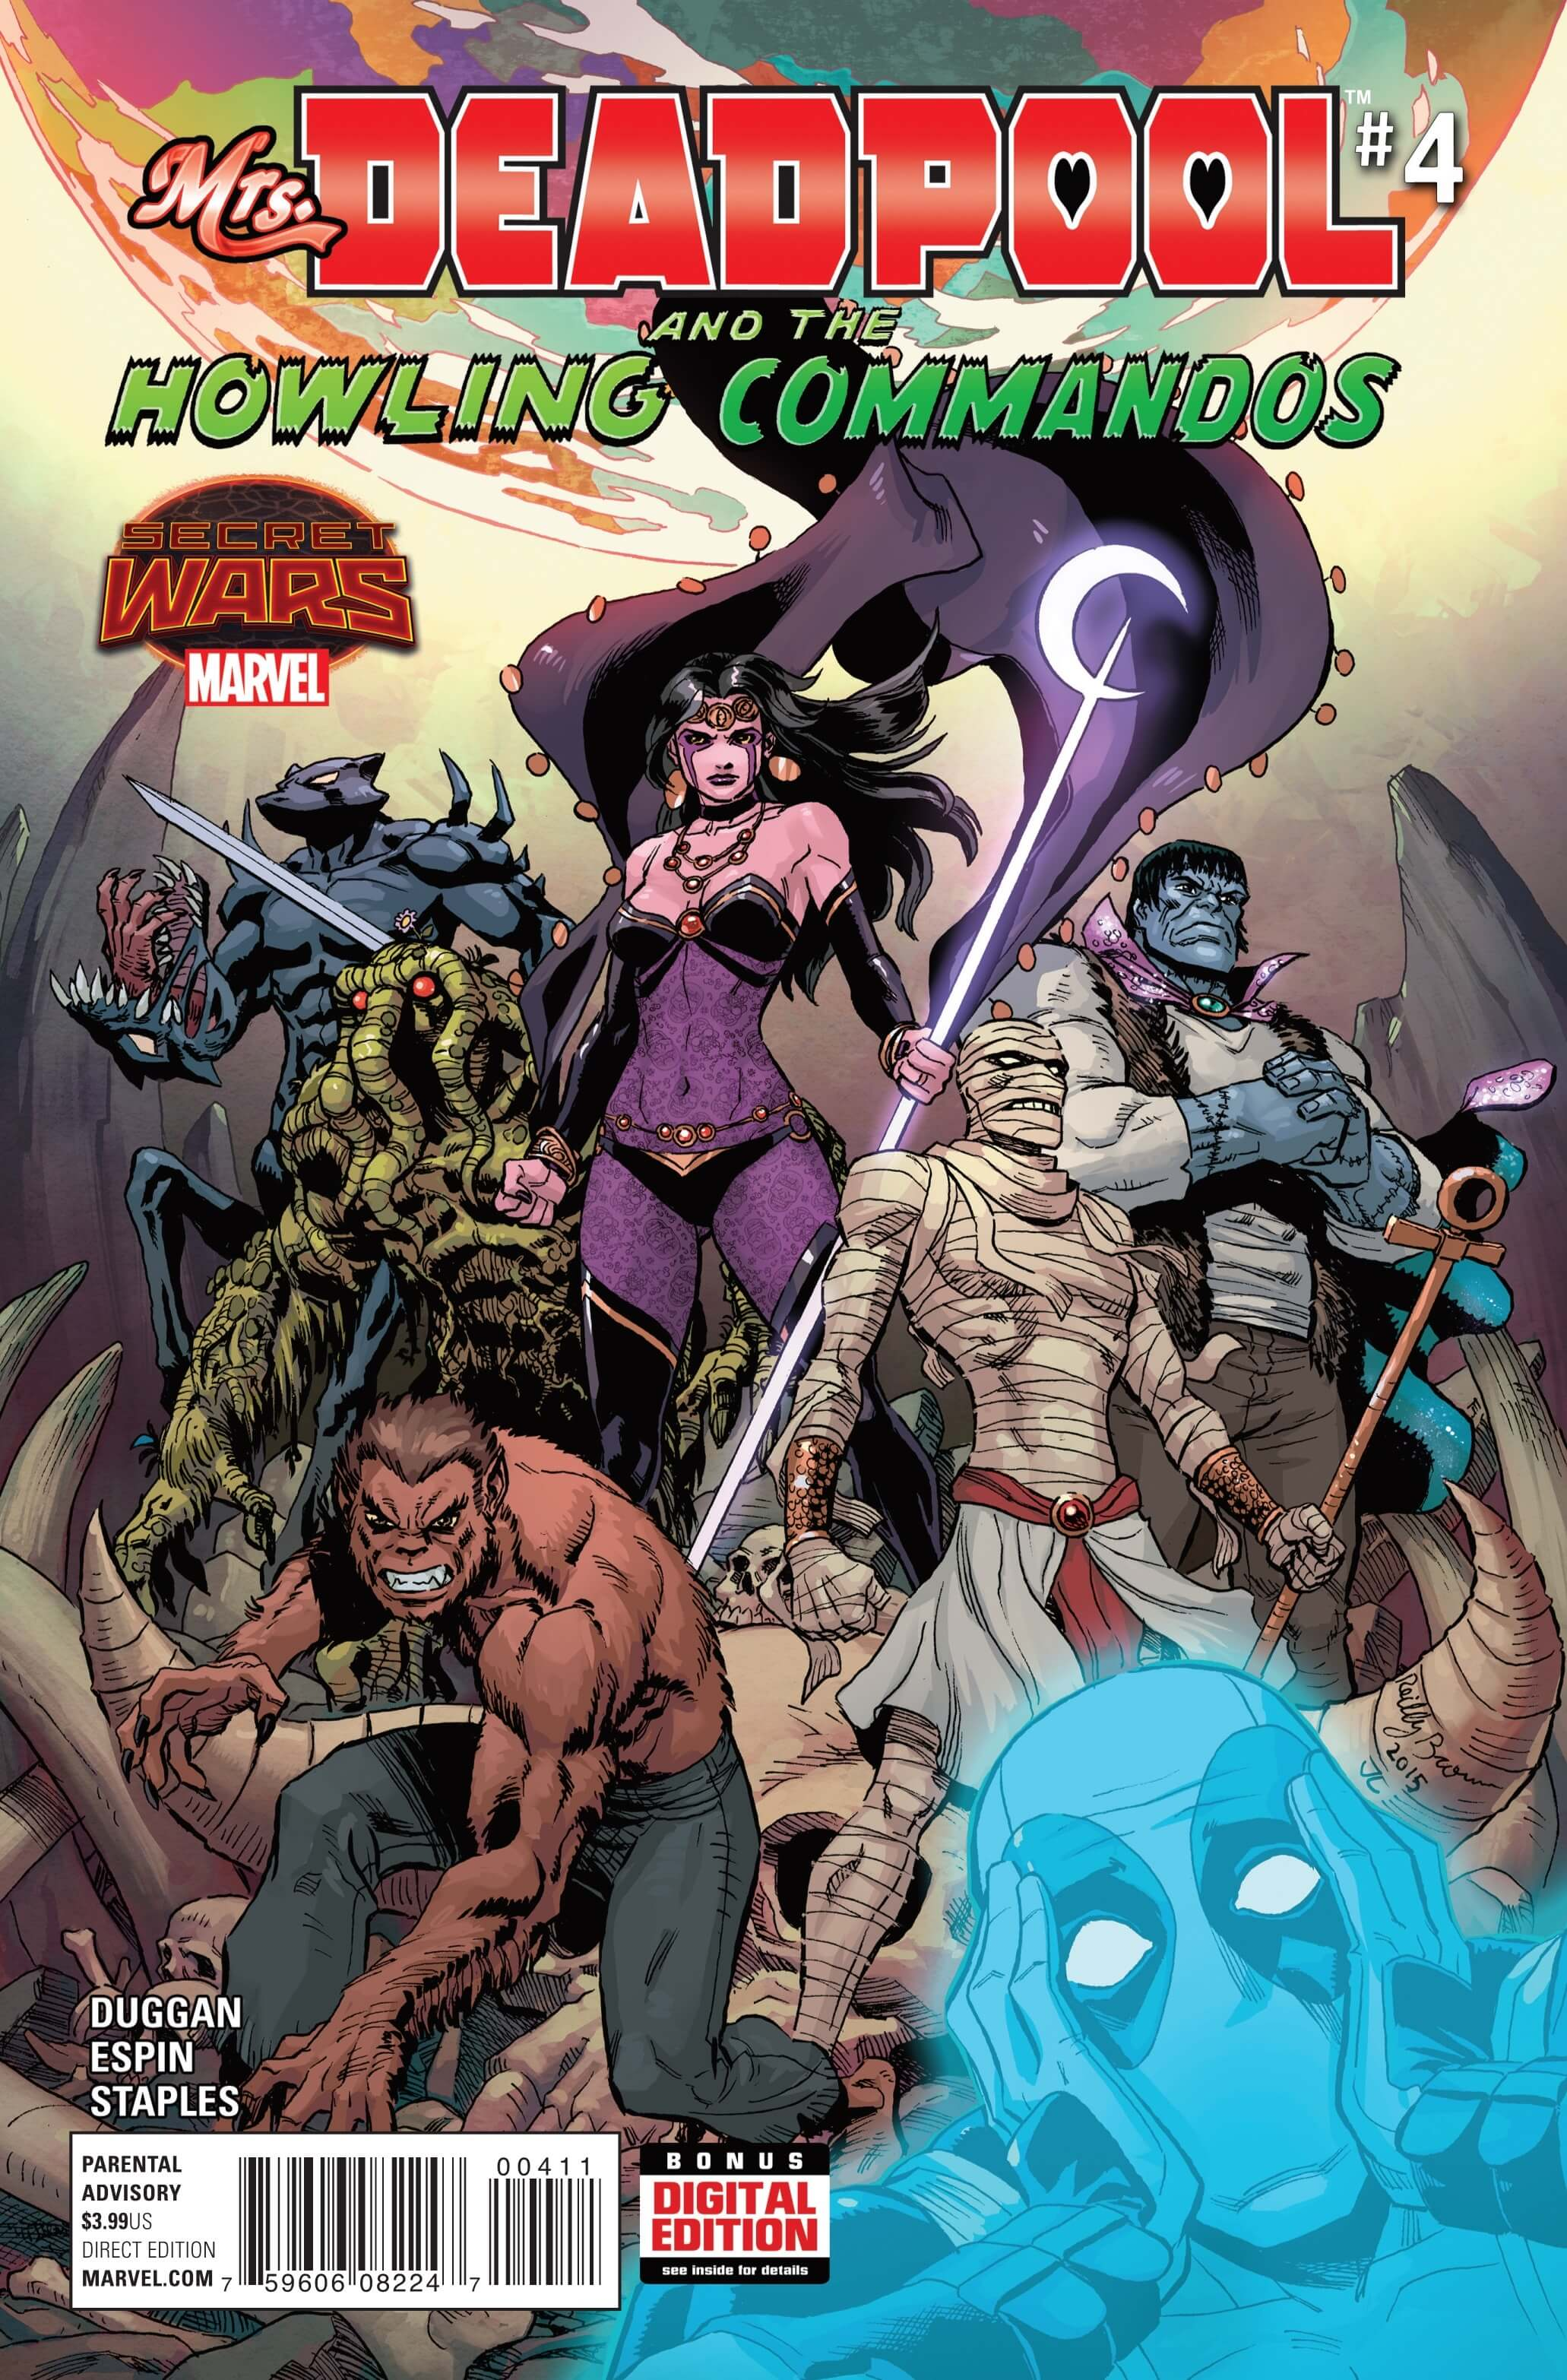 Mrs. Deadpool and the Howling Commandos #4cvrA